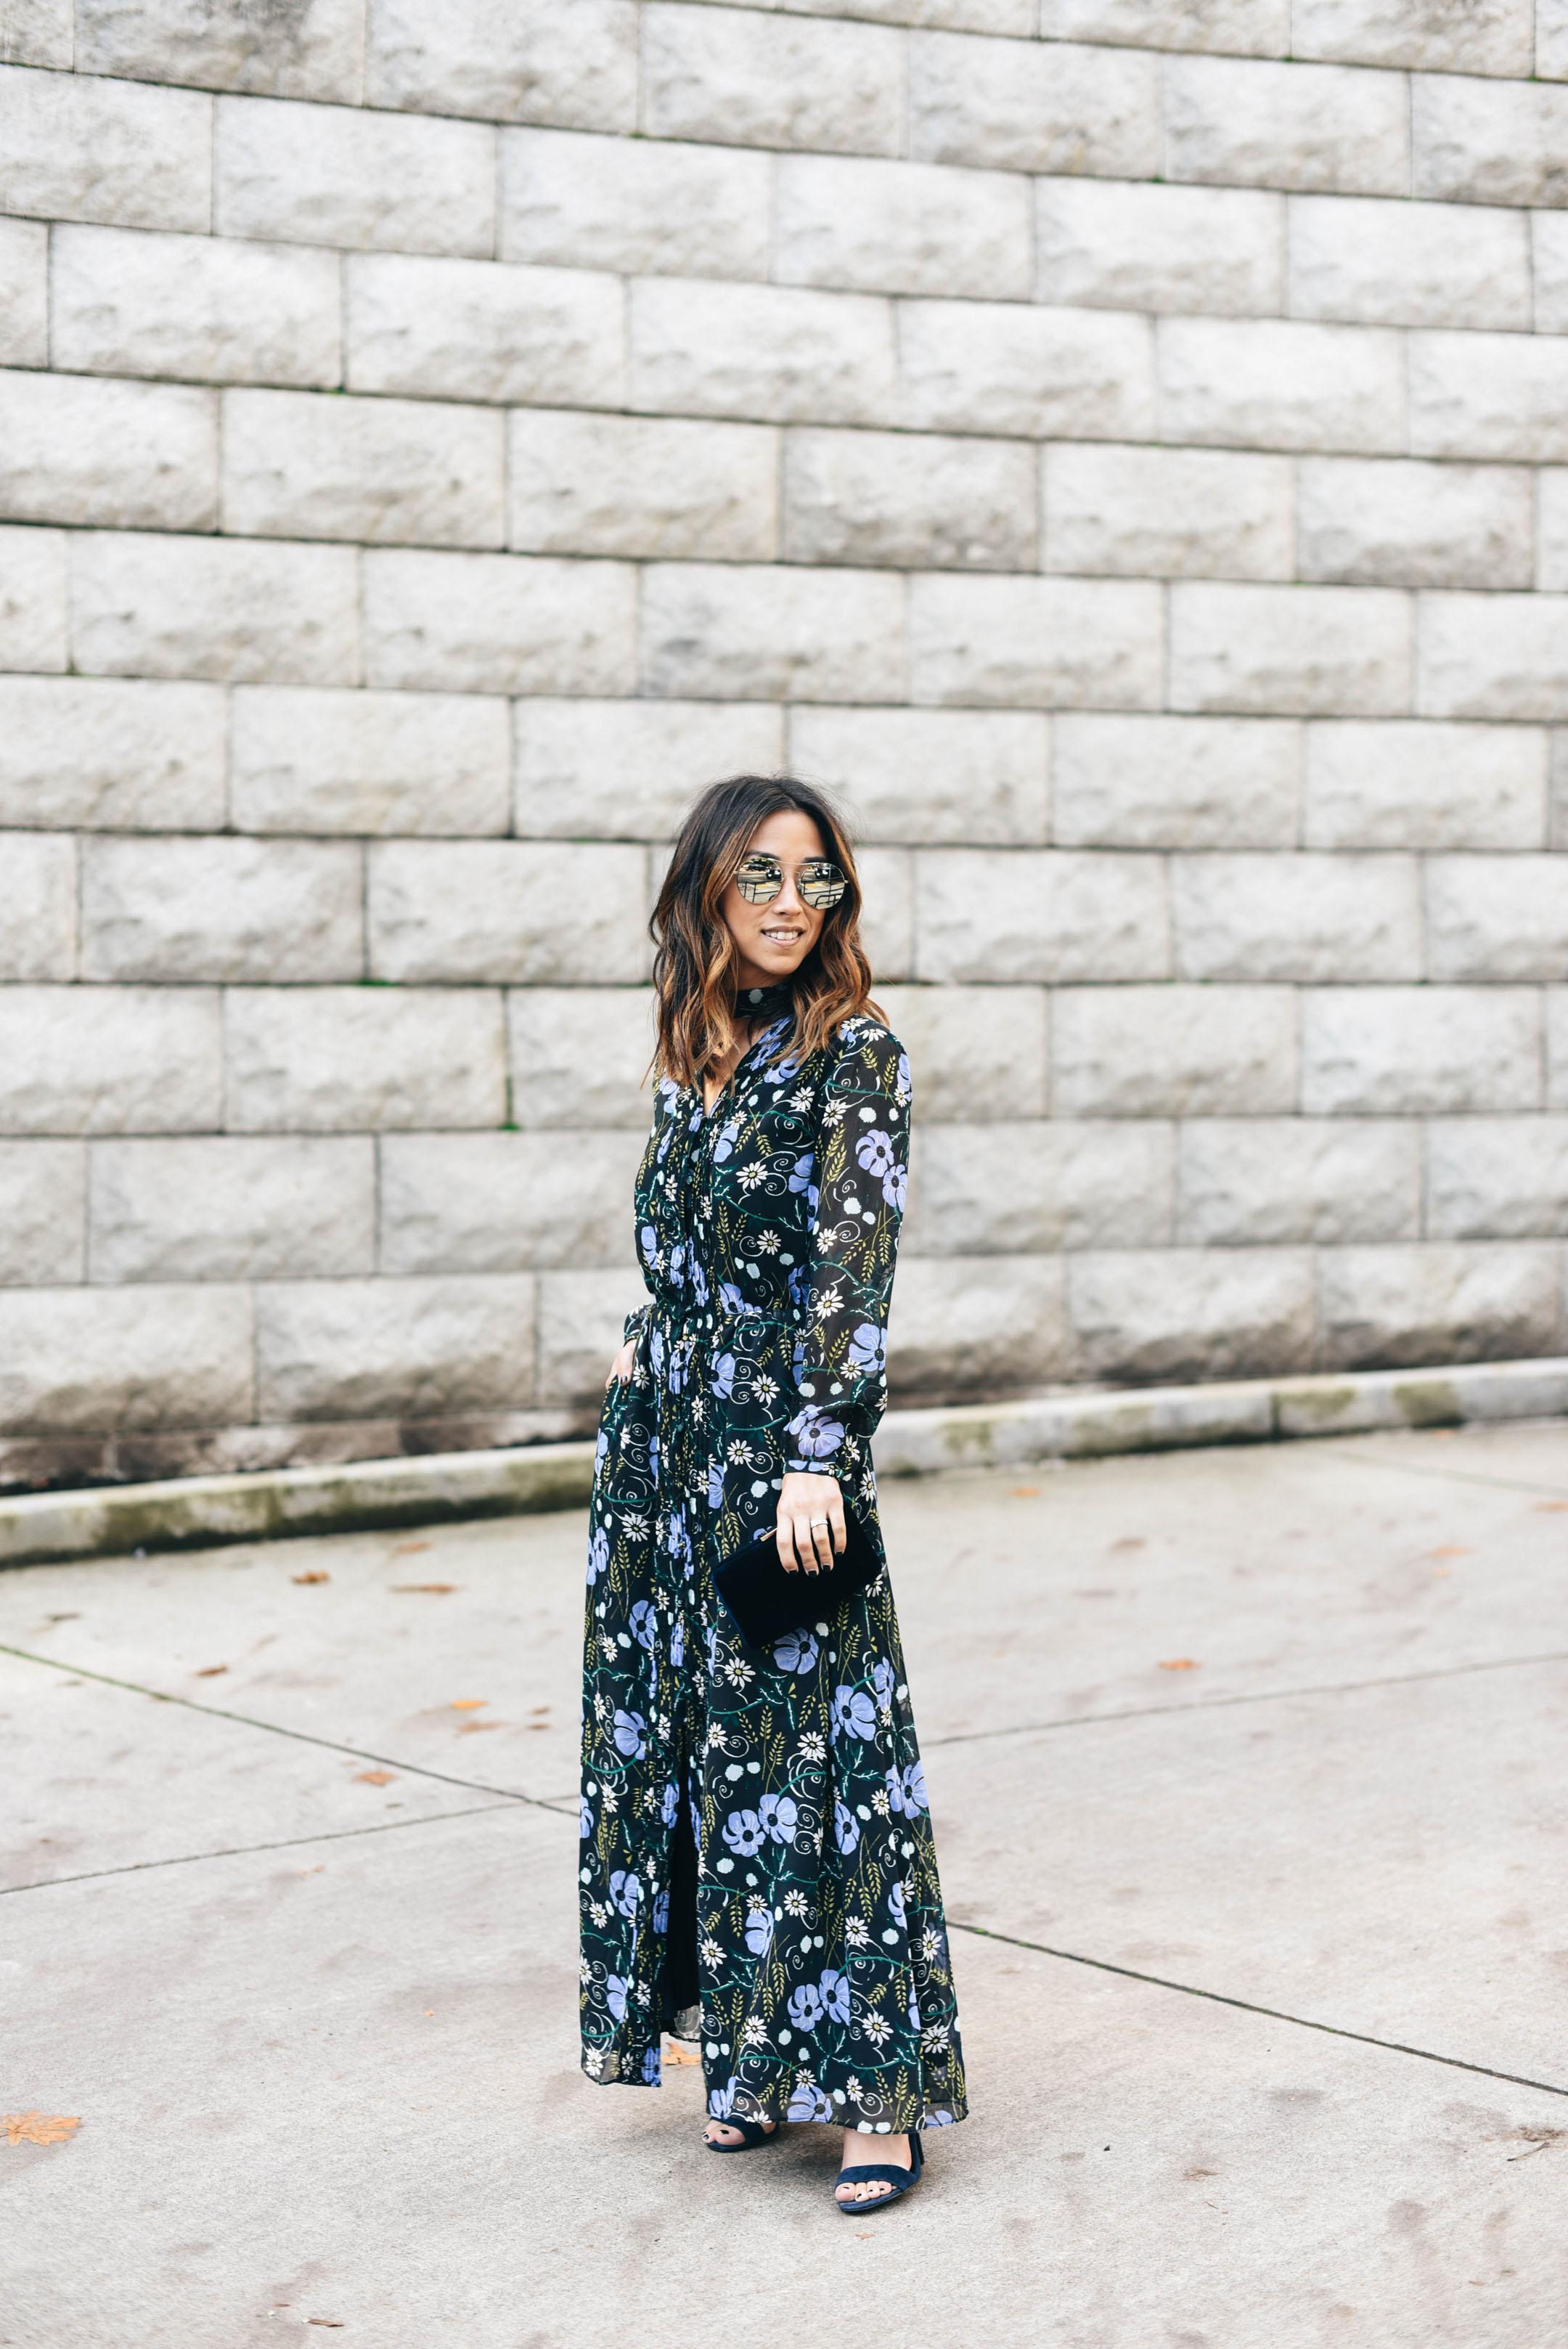 crystalin-marie-wearing-shevoke-mirrored-sunglasses